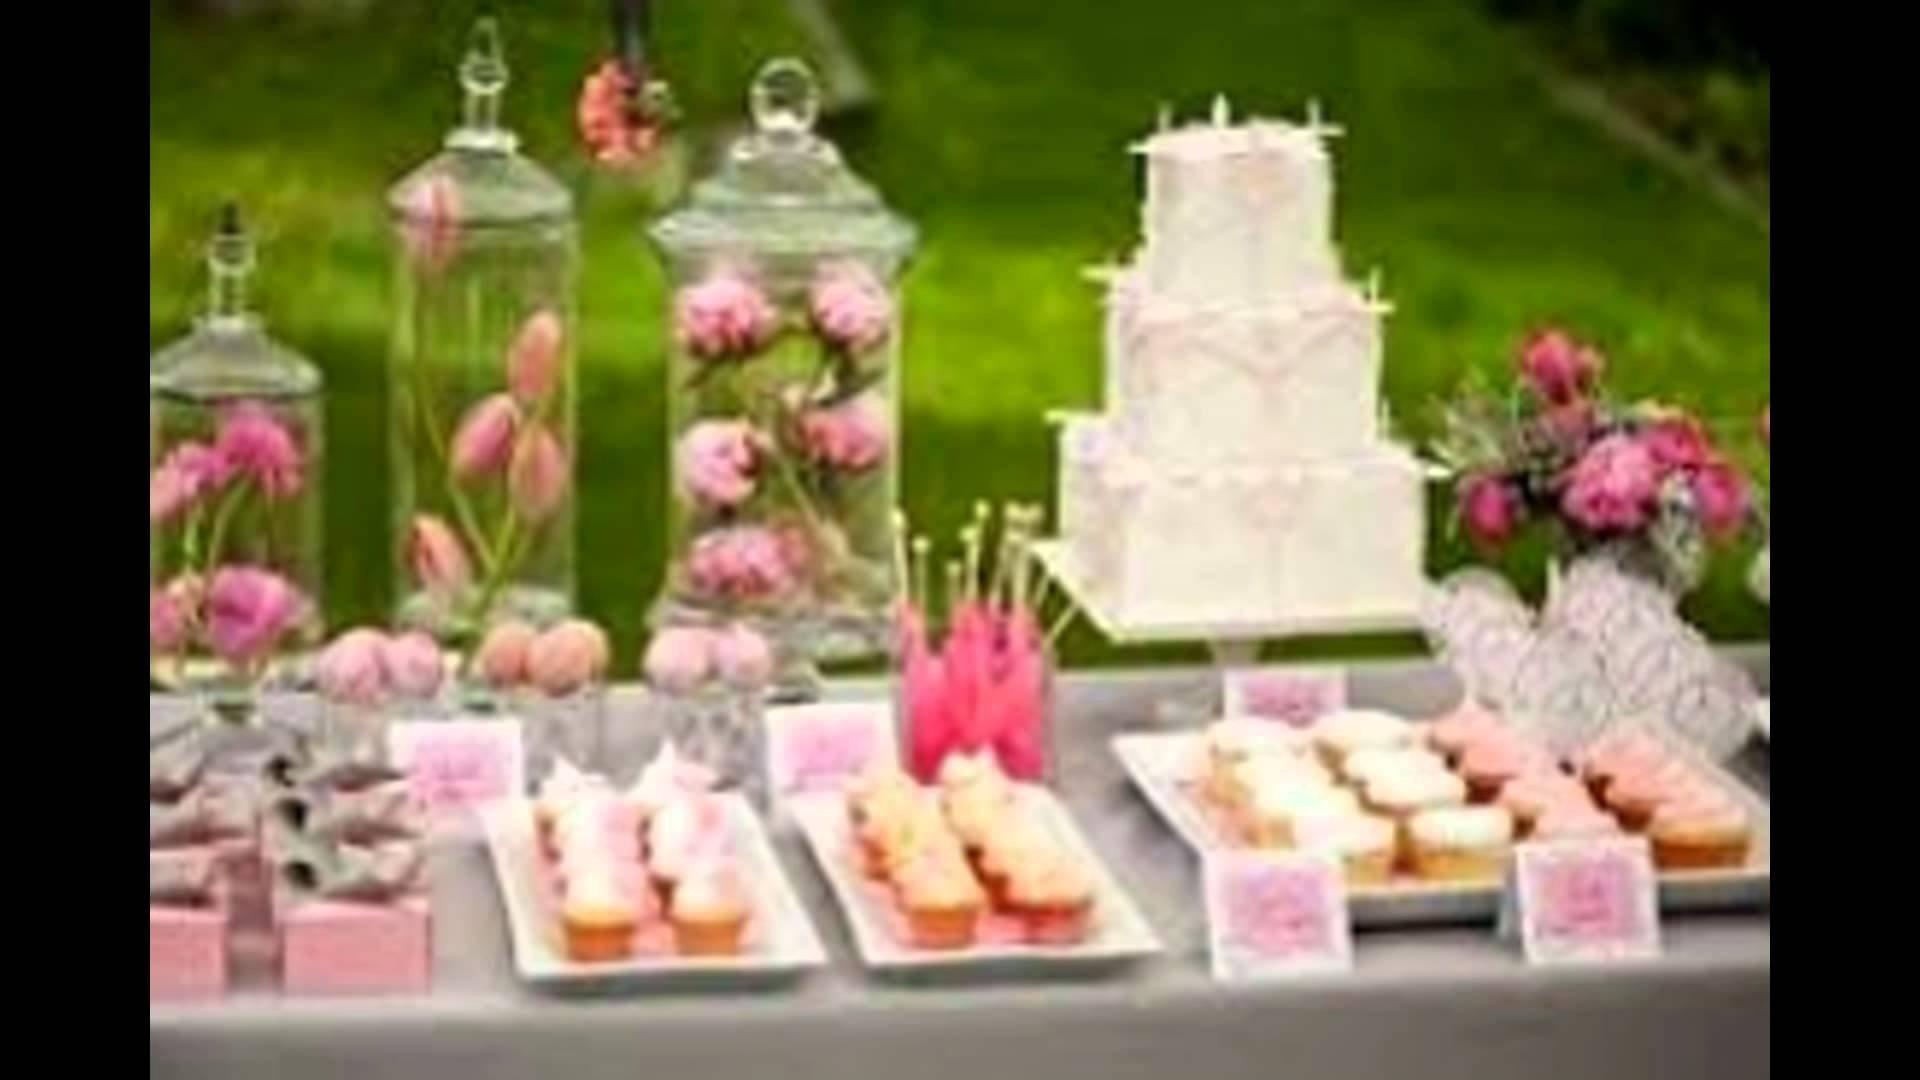 10 Fabulous Baby Shower Table Decoration Ideas baby shower table decorations youtube 2020